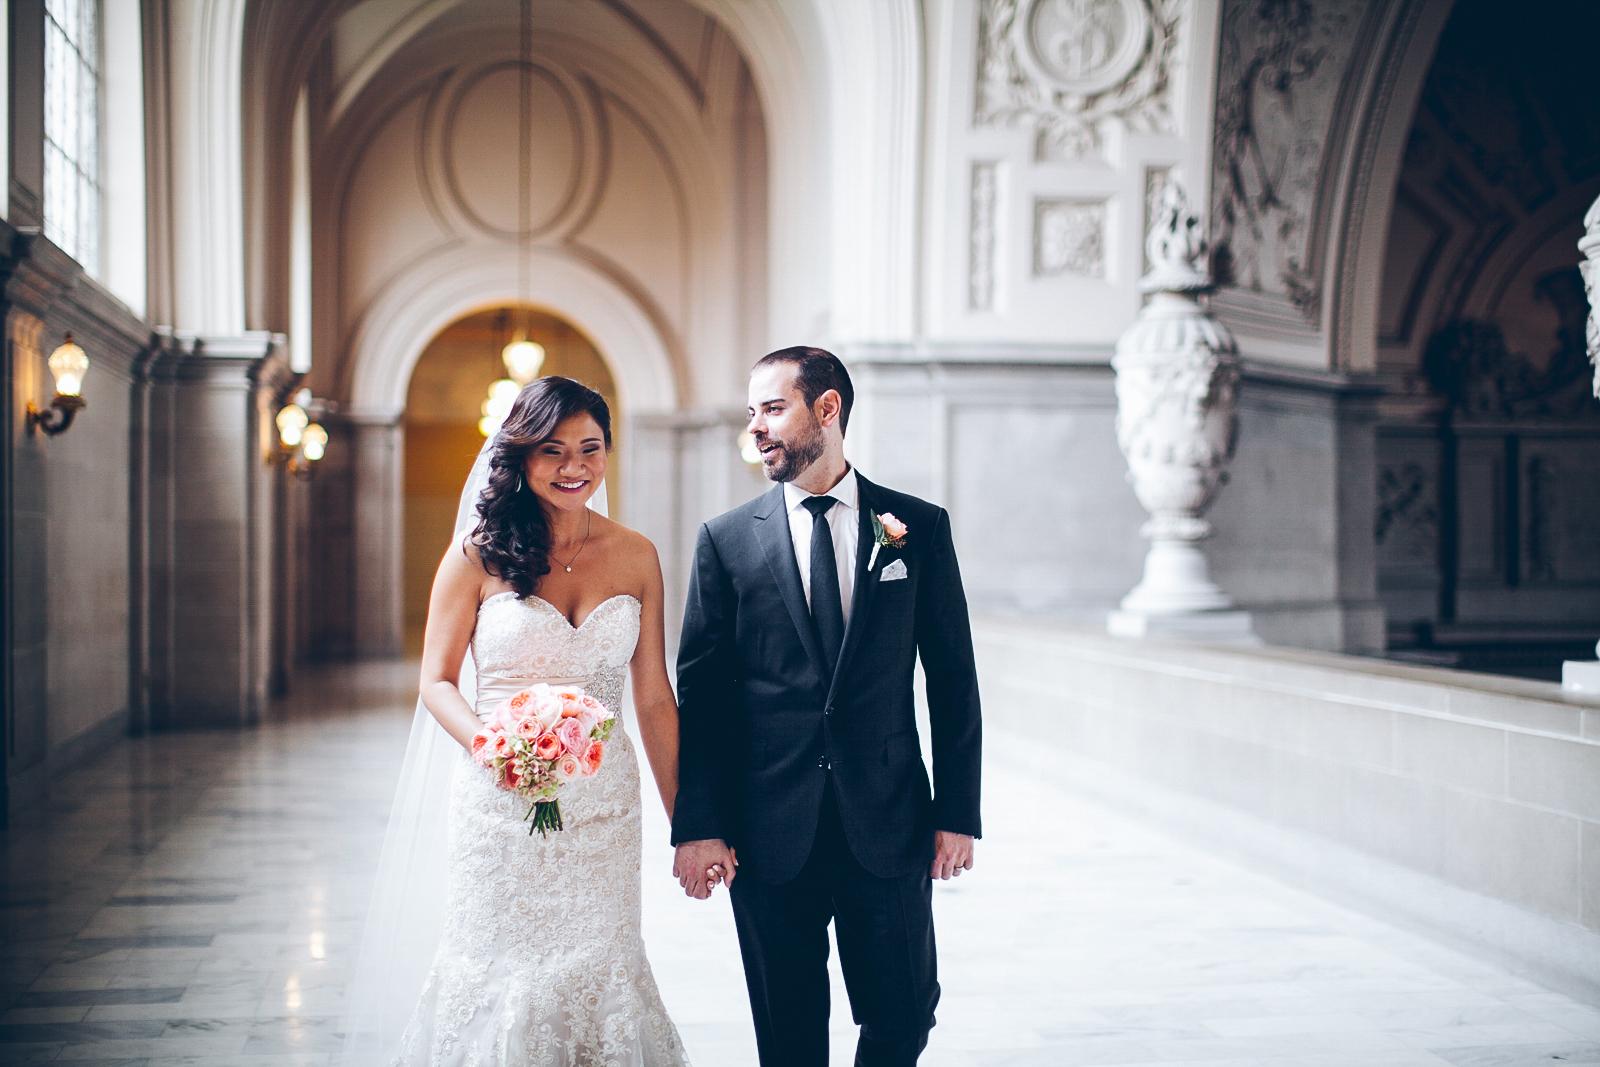 San_francisco_city_hall_wedding_photography_meegan_travis_ebony_siovhan_bokeh_photography_42.jpg